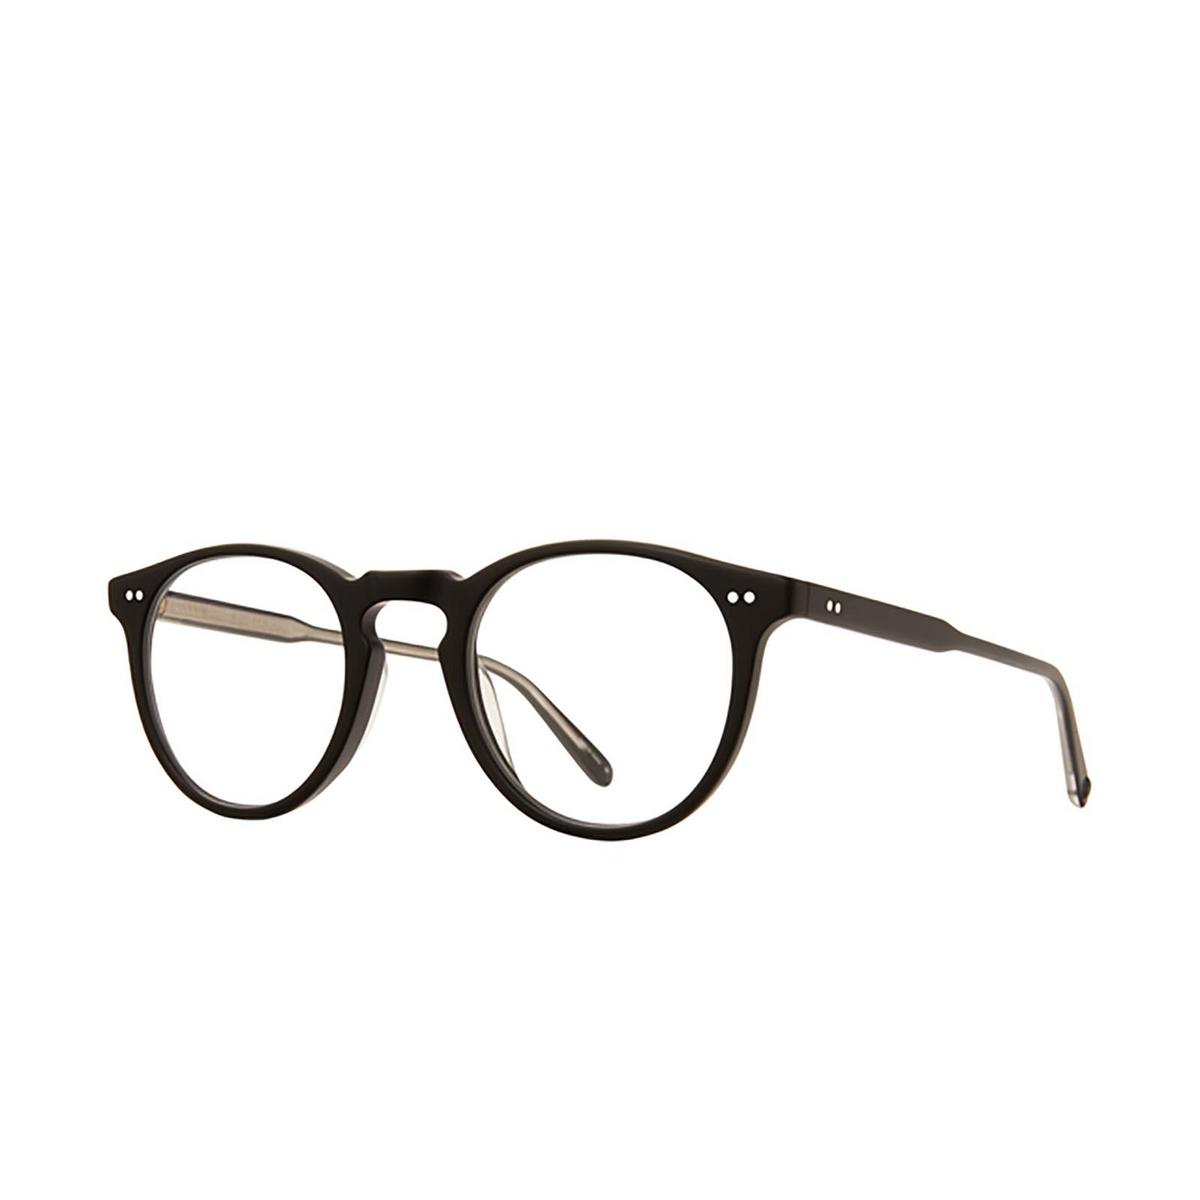 Garrett Leight® Round Eyeglasses: Glencoe color Matte Black Mbk - three-quarters view.